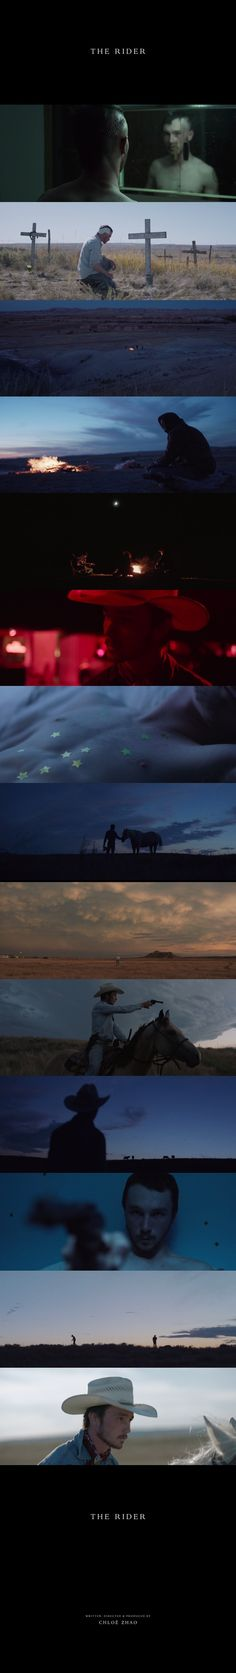 The Rider // Directed by Chloé Zhao // Cinematography Joshua James Richards Cinematic Photography, Film Photography, Cinema Movies, Film Movie, Cinematic Lighting, Documentary Filmmaking, James Richards, Joshua James, Light Film